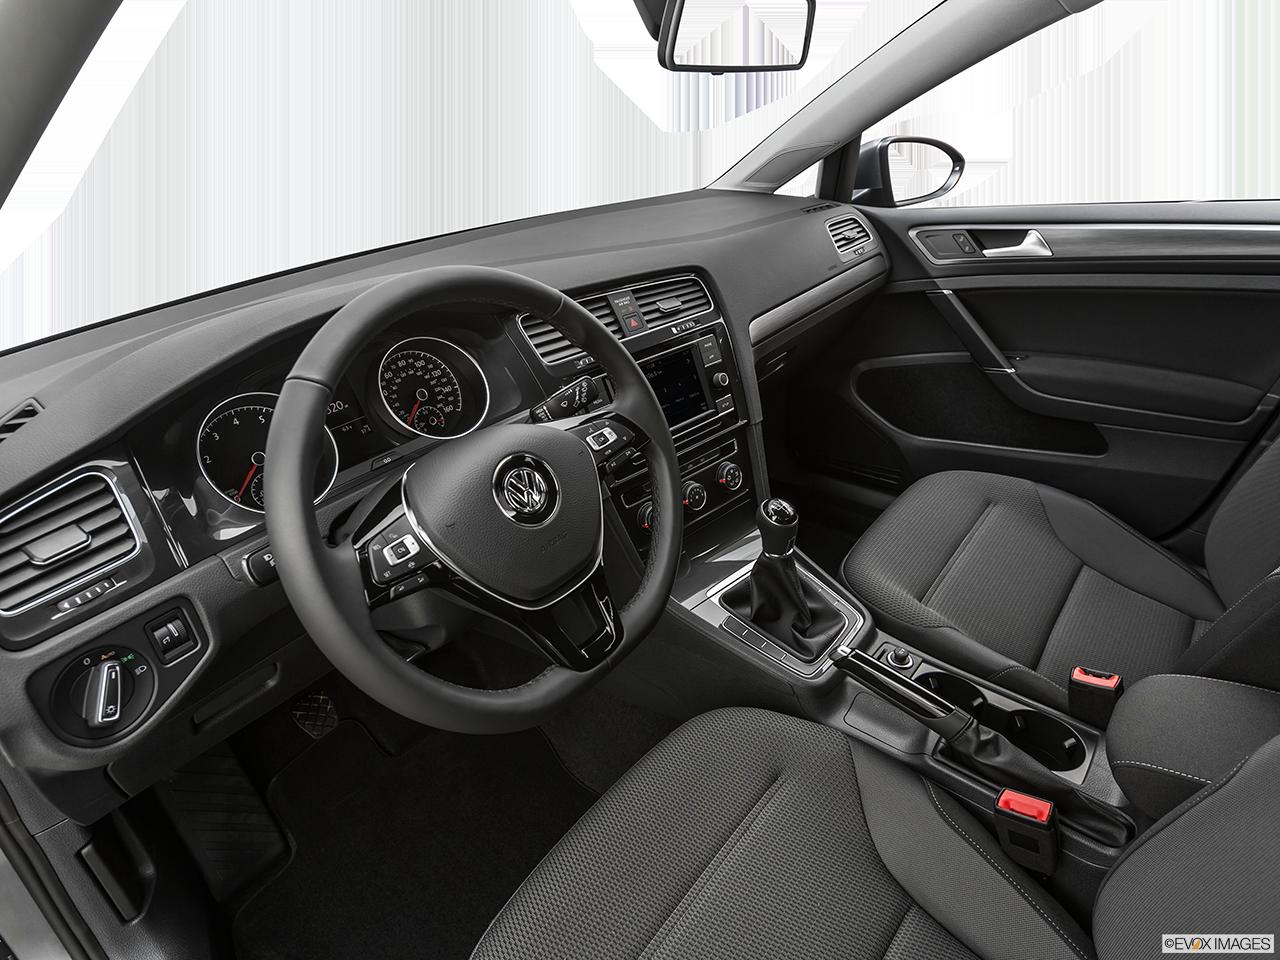 2019 Volkswagen Golf photo